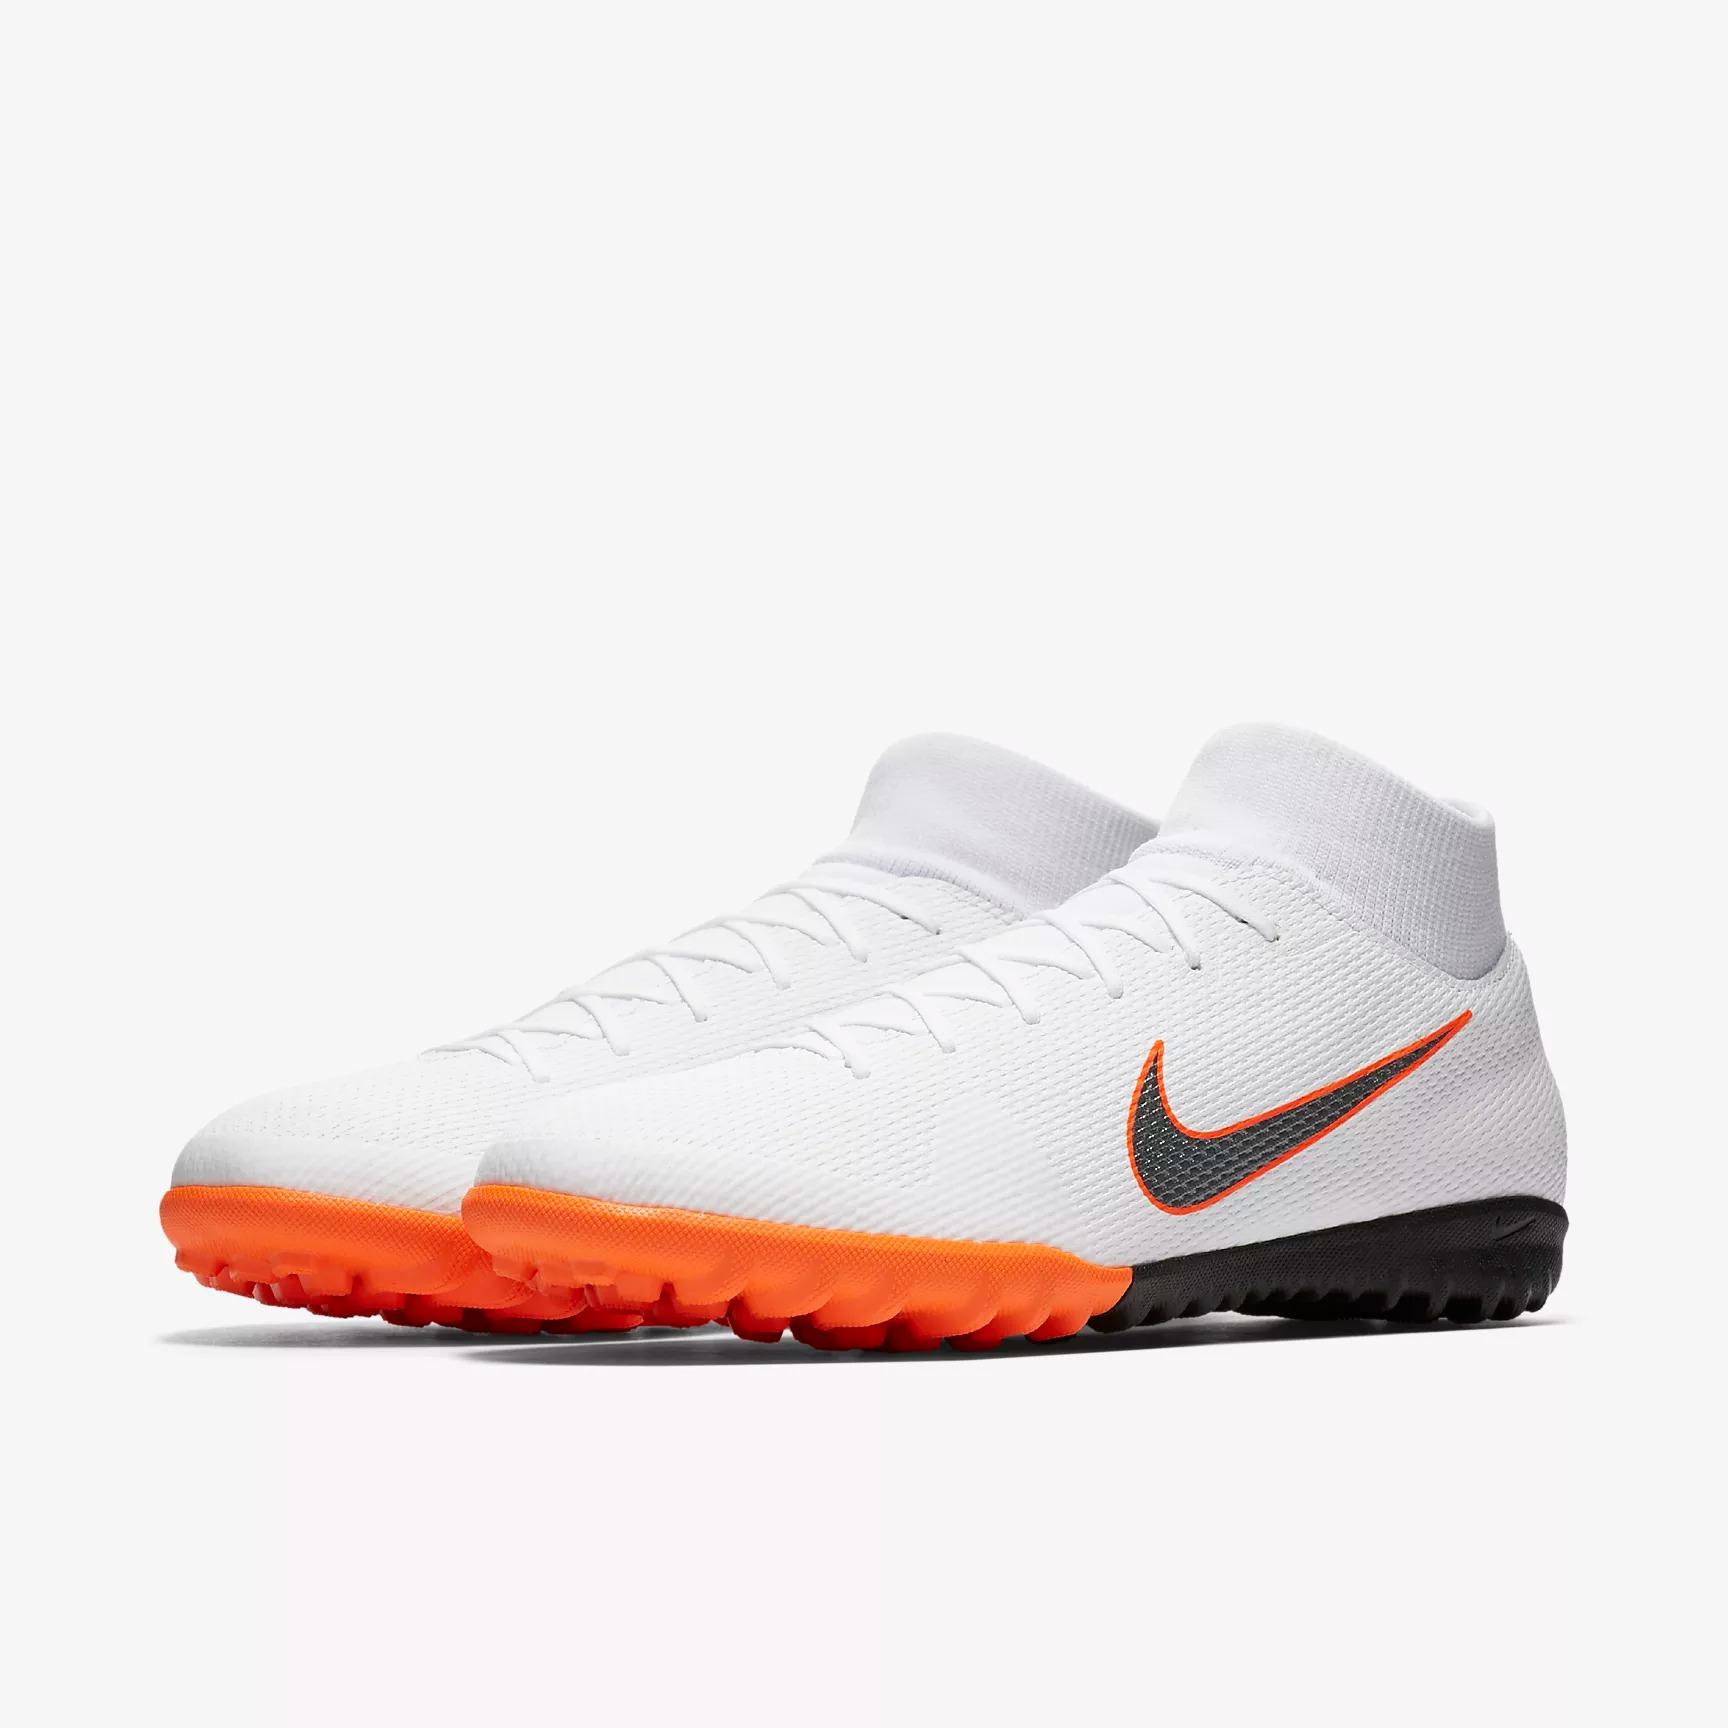 80b136433 Nike MercurialX Superfly VI Academy TF Soccer Cleats - Soccer Cleats Nike  Football Boots - Superfanas.lt